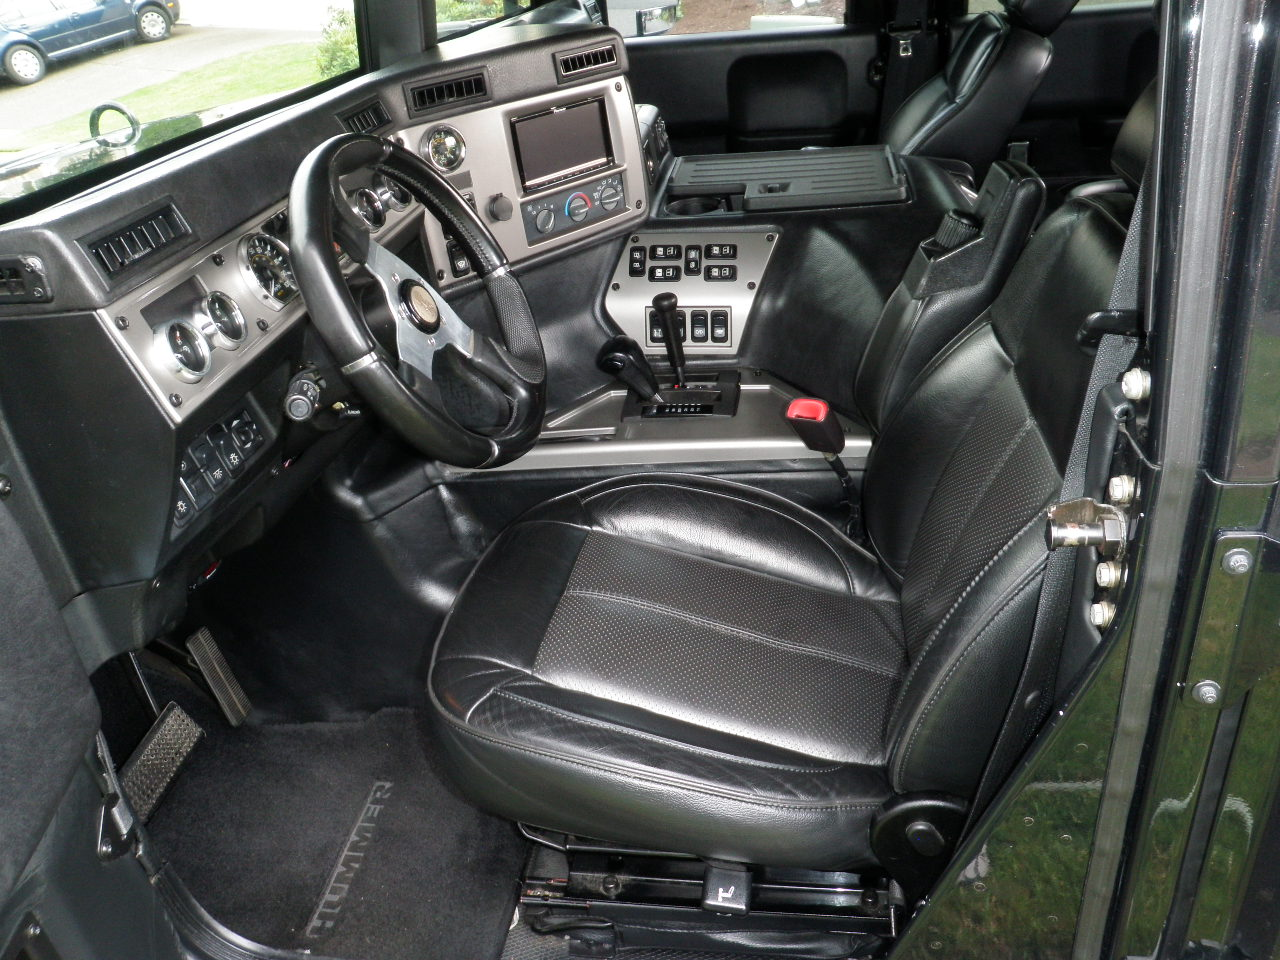 2006 hummer h1 alpha custom sema show trucksold p1010030 p1010058 p1010073 p1010031 p1010036 p1010038 p1010039 p1010048 p1010051 p1010052 p1010062 p1010065 p1010069 img2542 2006 hummer h1 alpha vanachro Choice Image